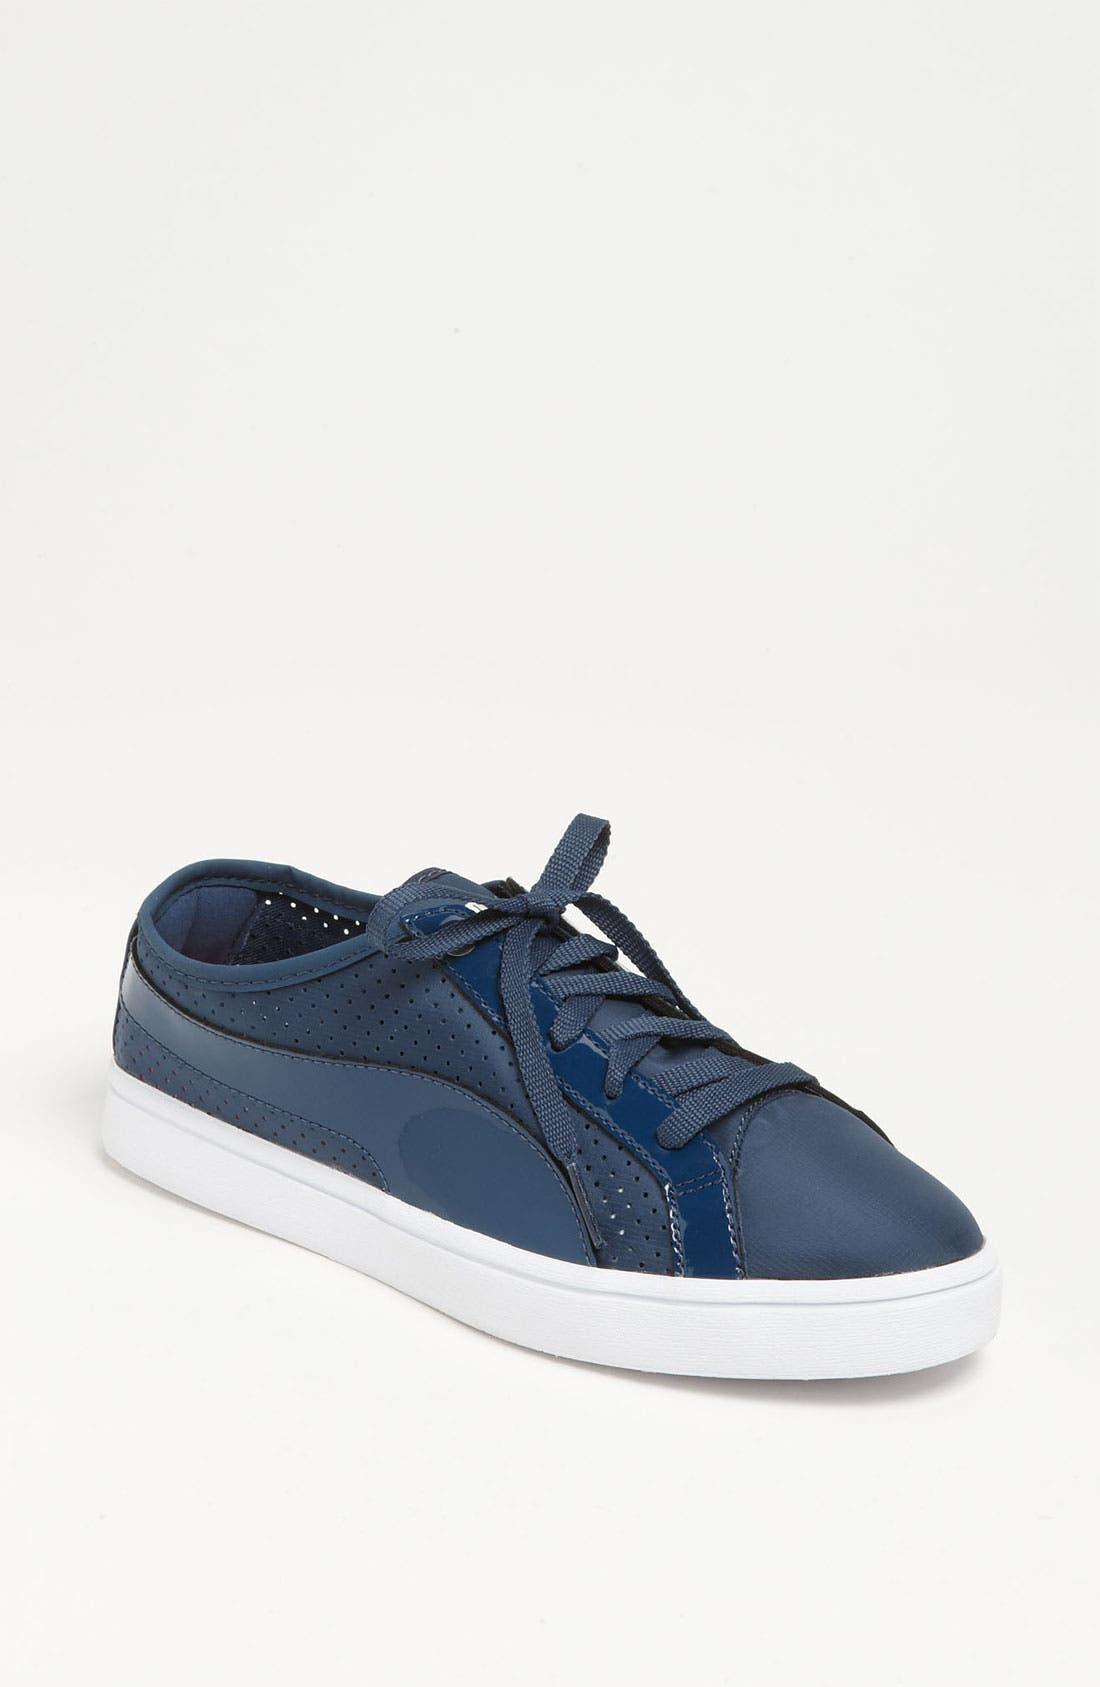 Main Image - PUMA 'Kai Lo' Sneaker (Women)